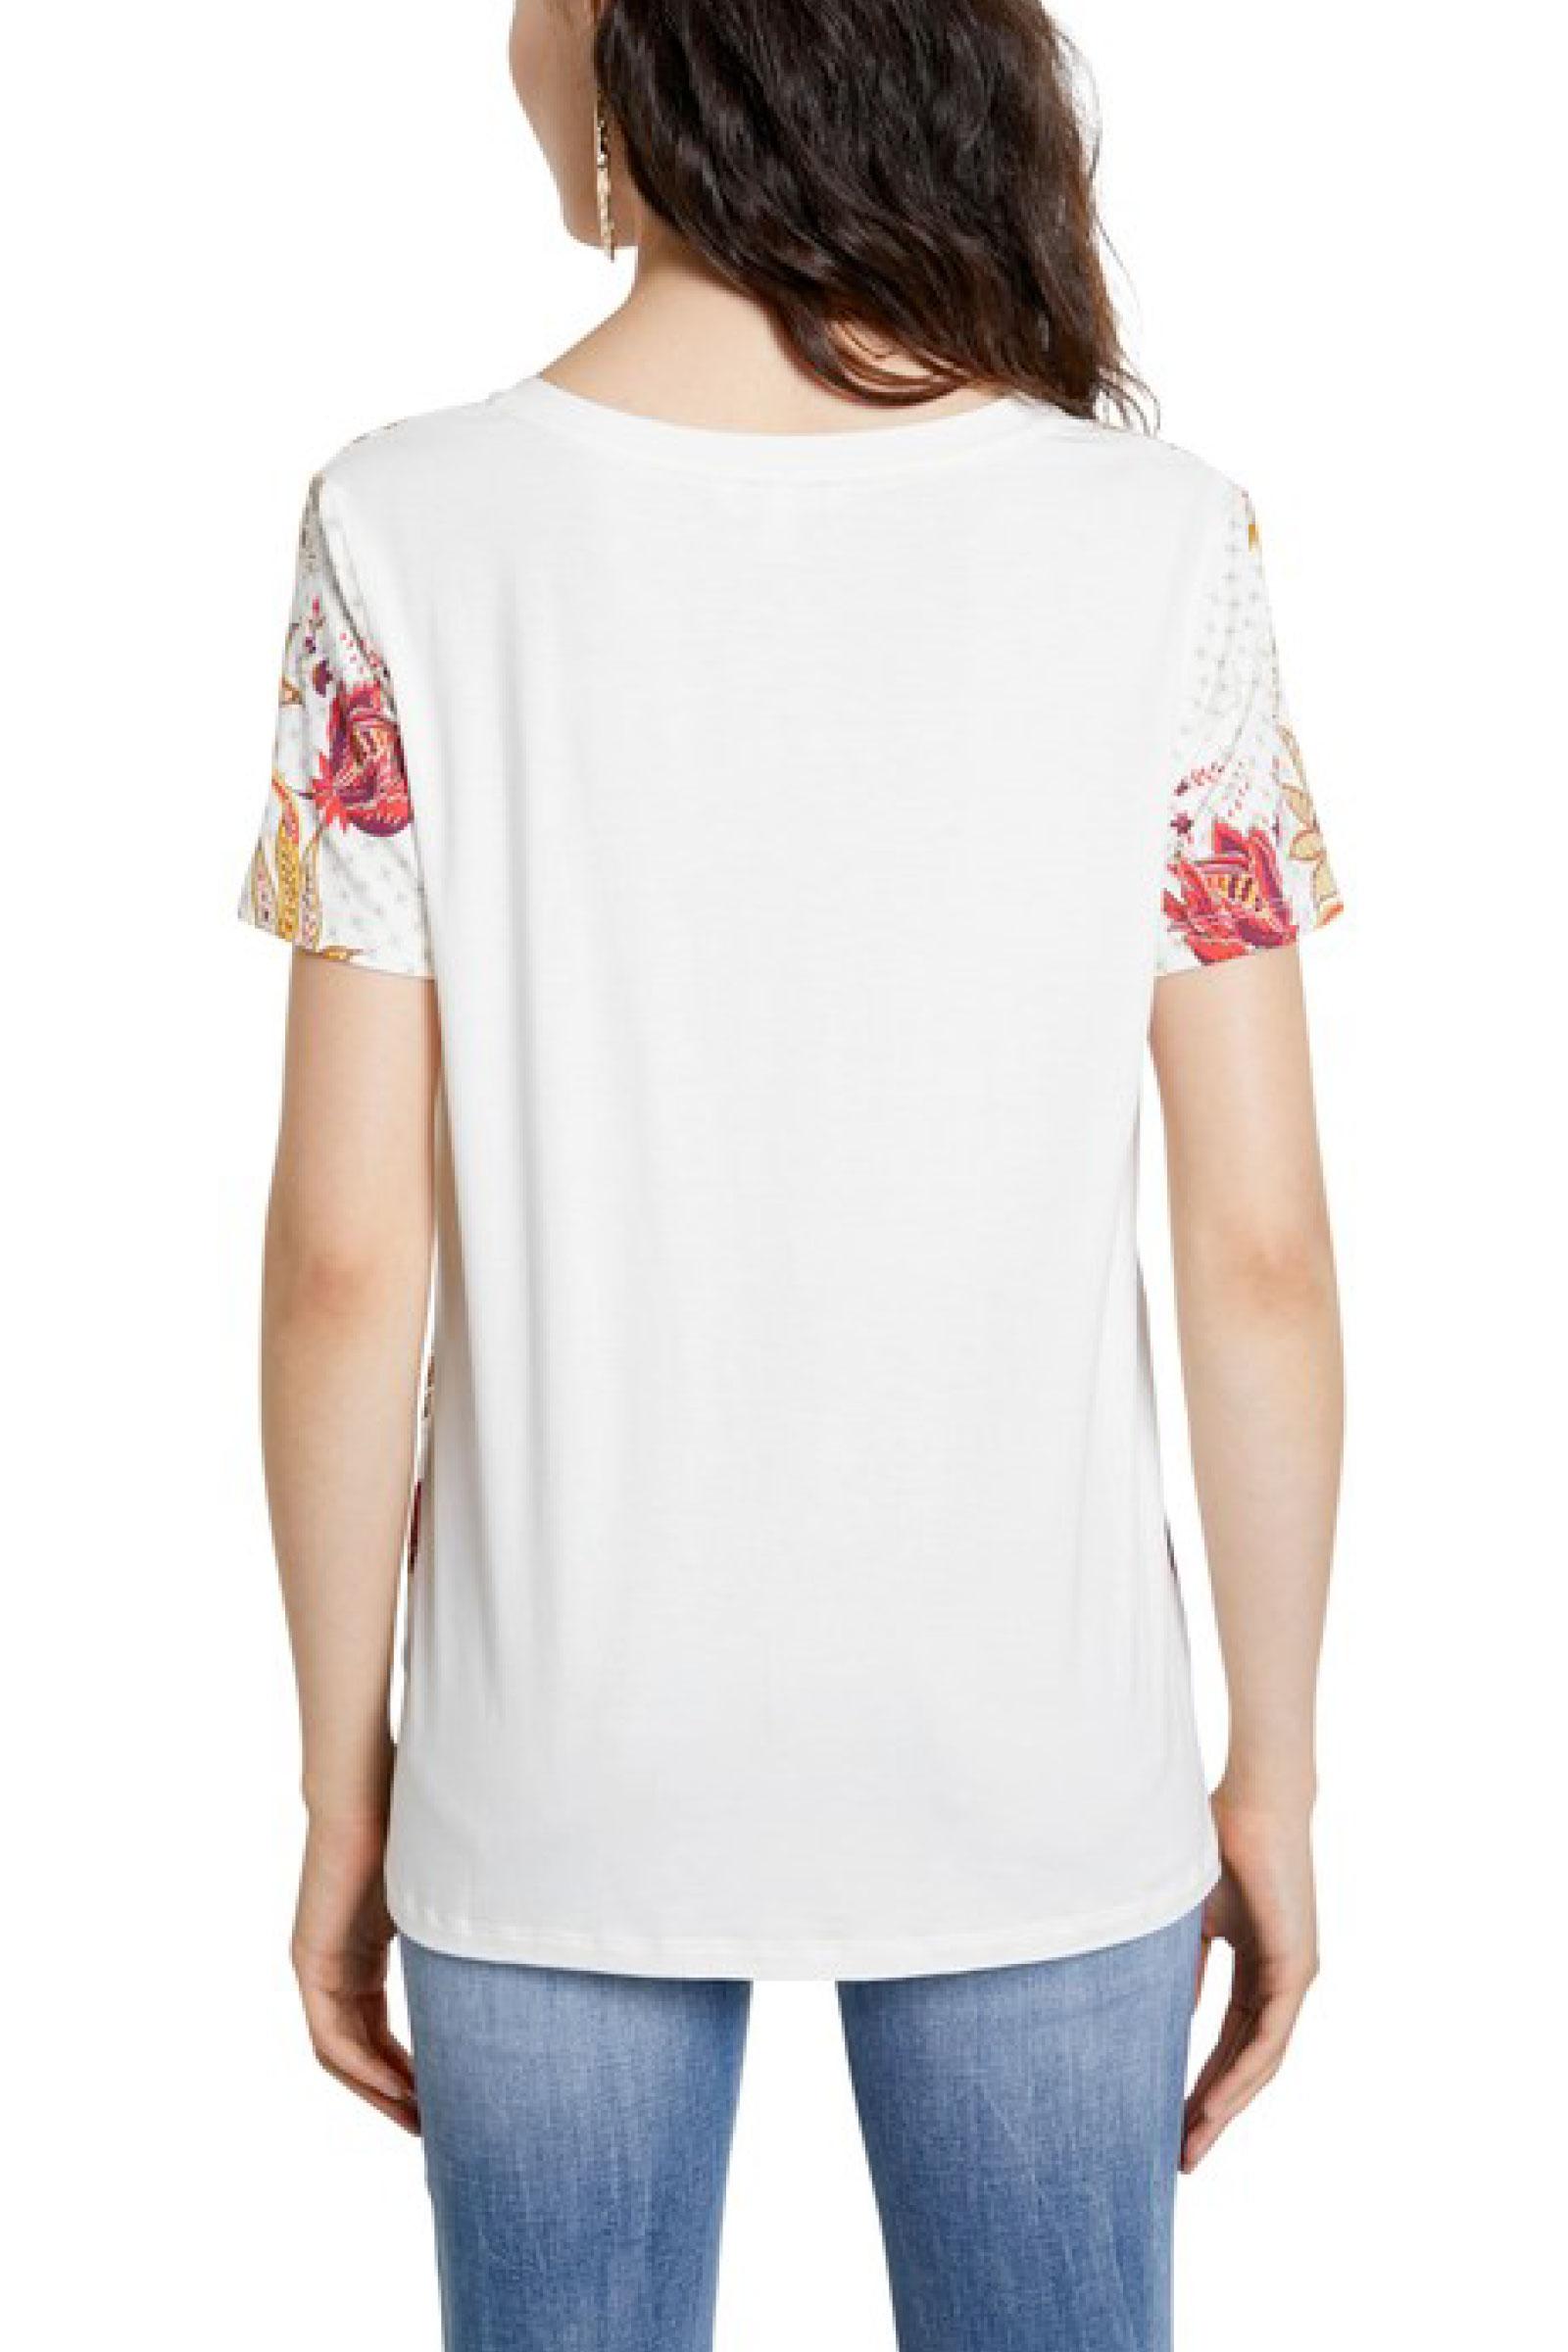 DESIGUAL   T-Shirt   21SWTK181000